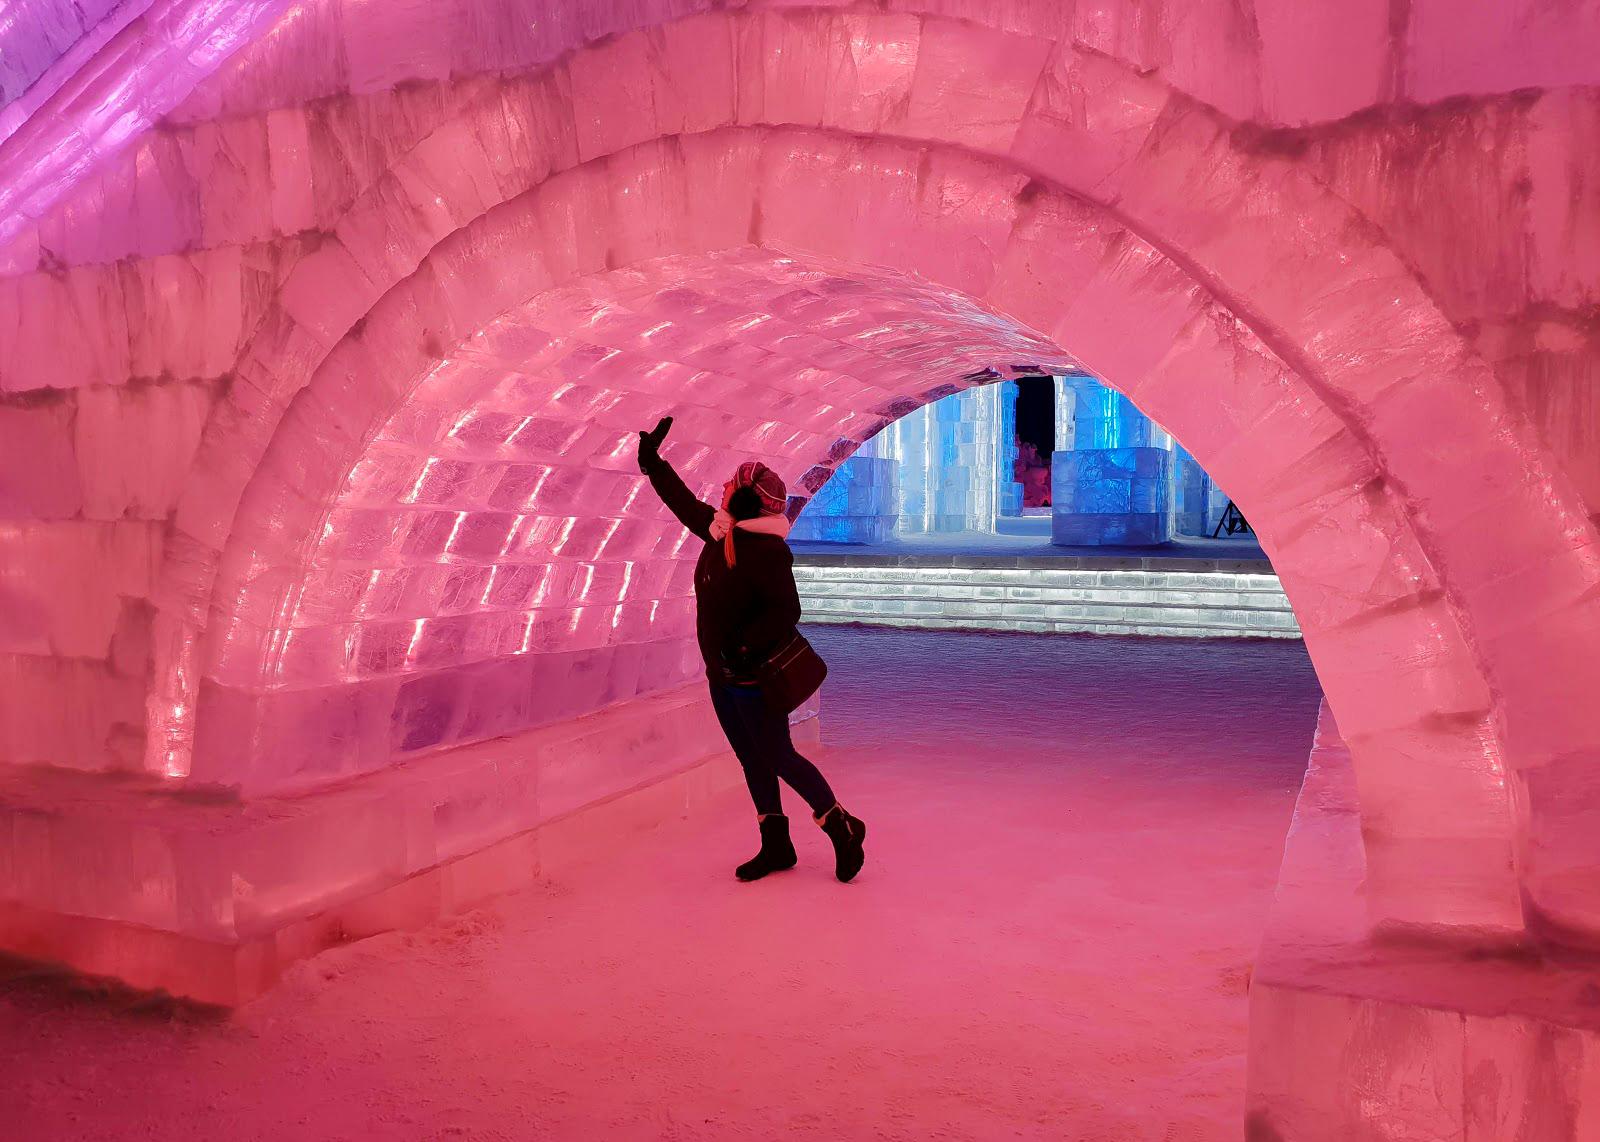 Rosie standing under an ice bridge lit in pink at Harbin Ice and Snow World